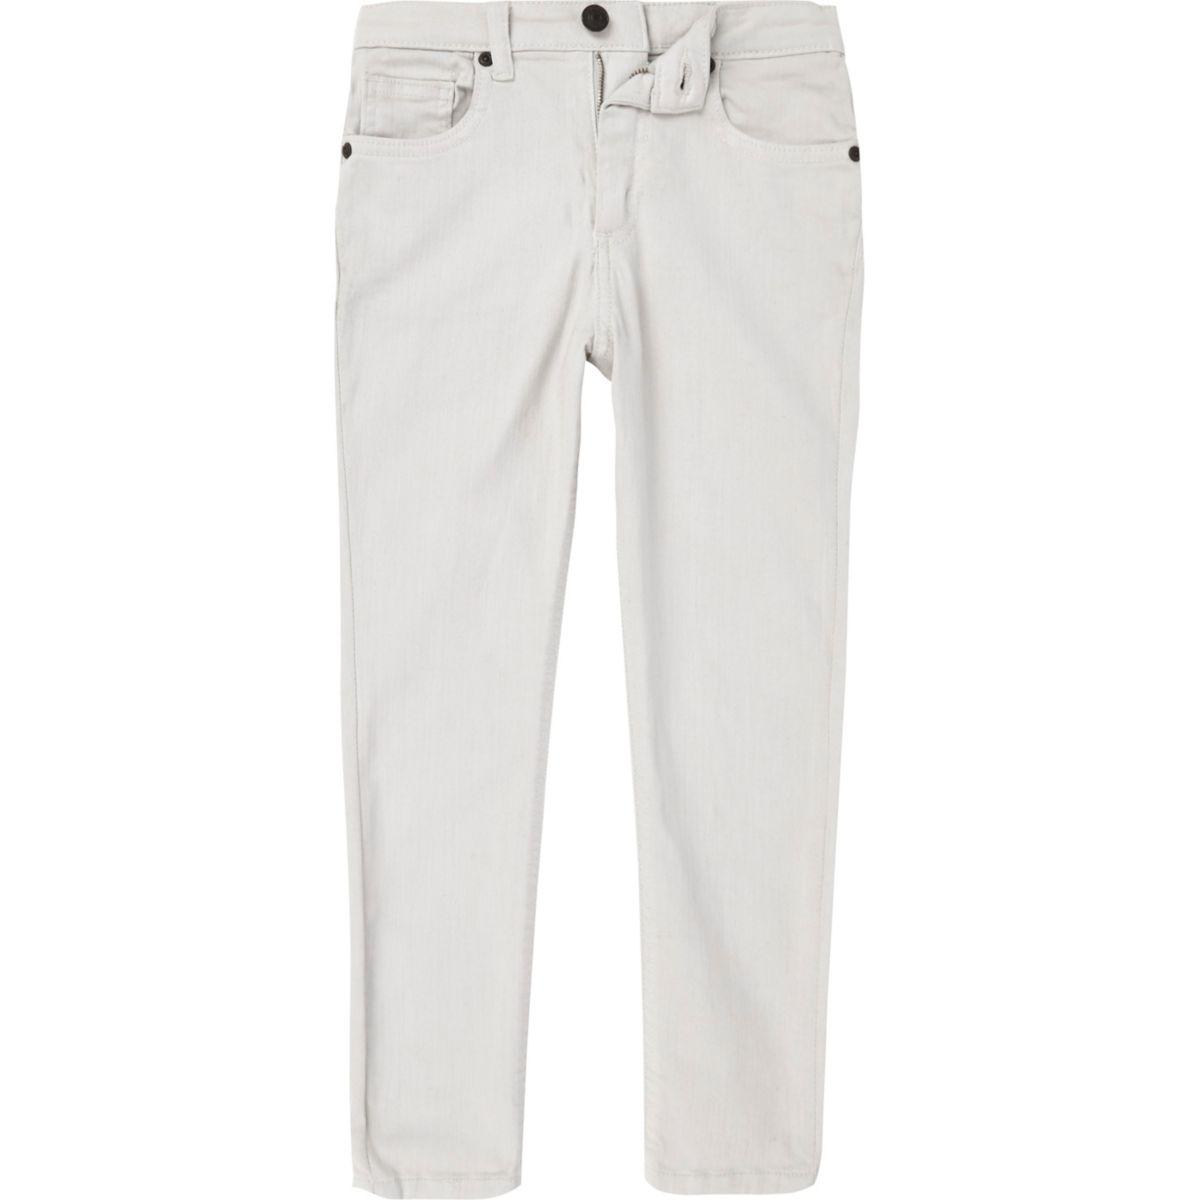 Boys stone wash Sid skinny jeans